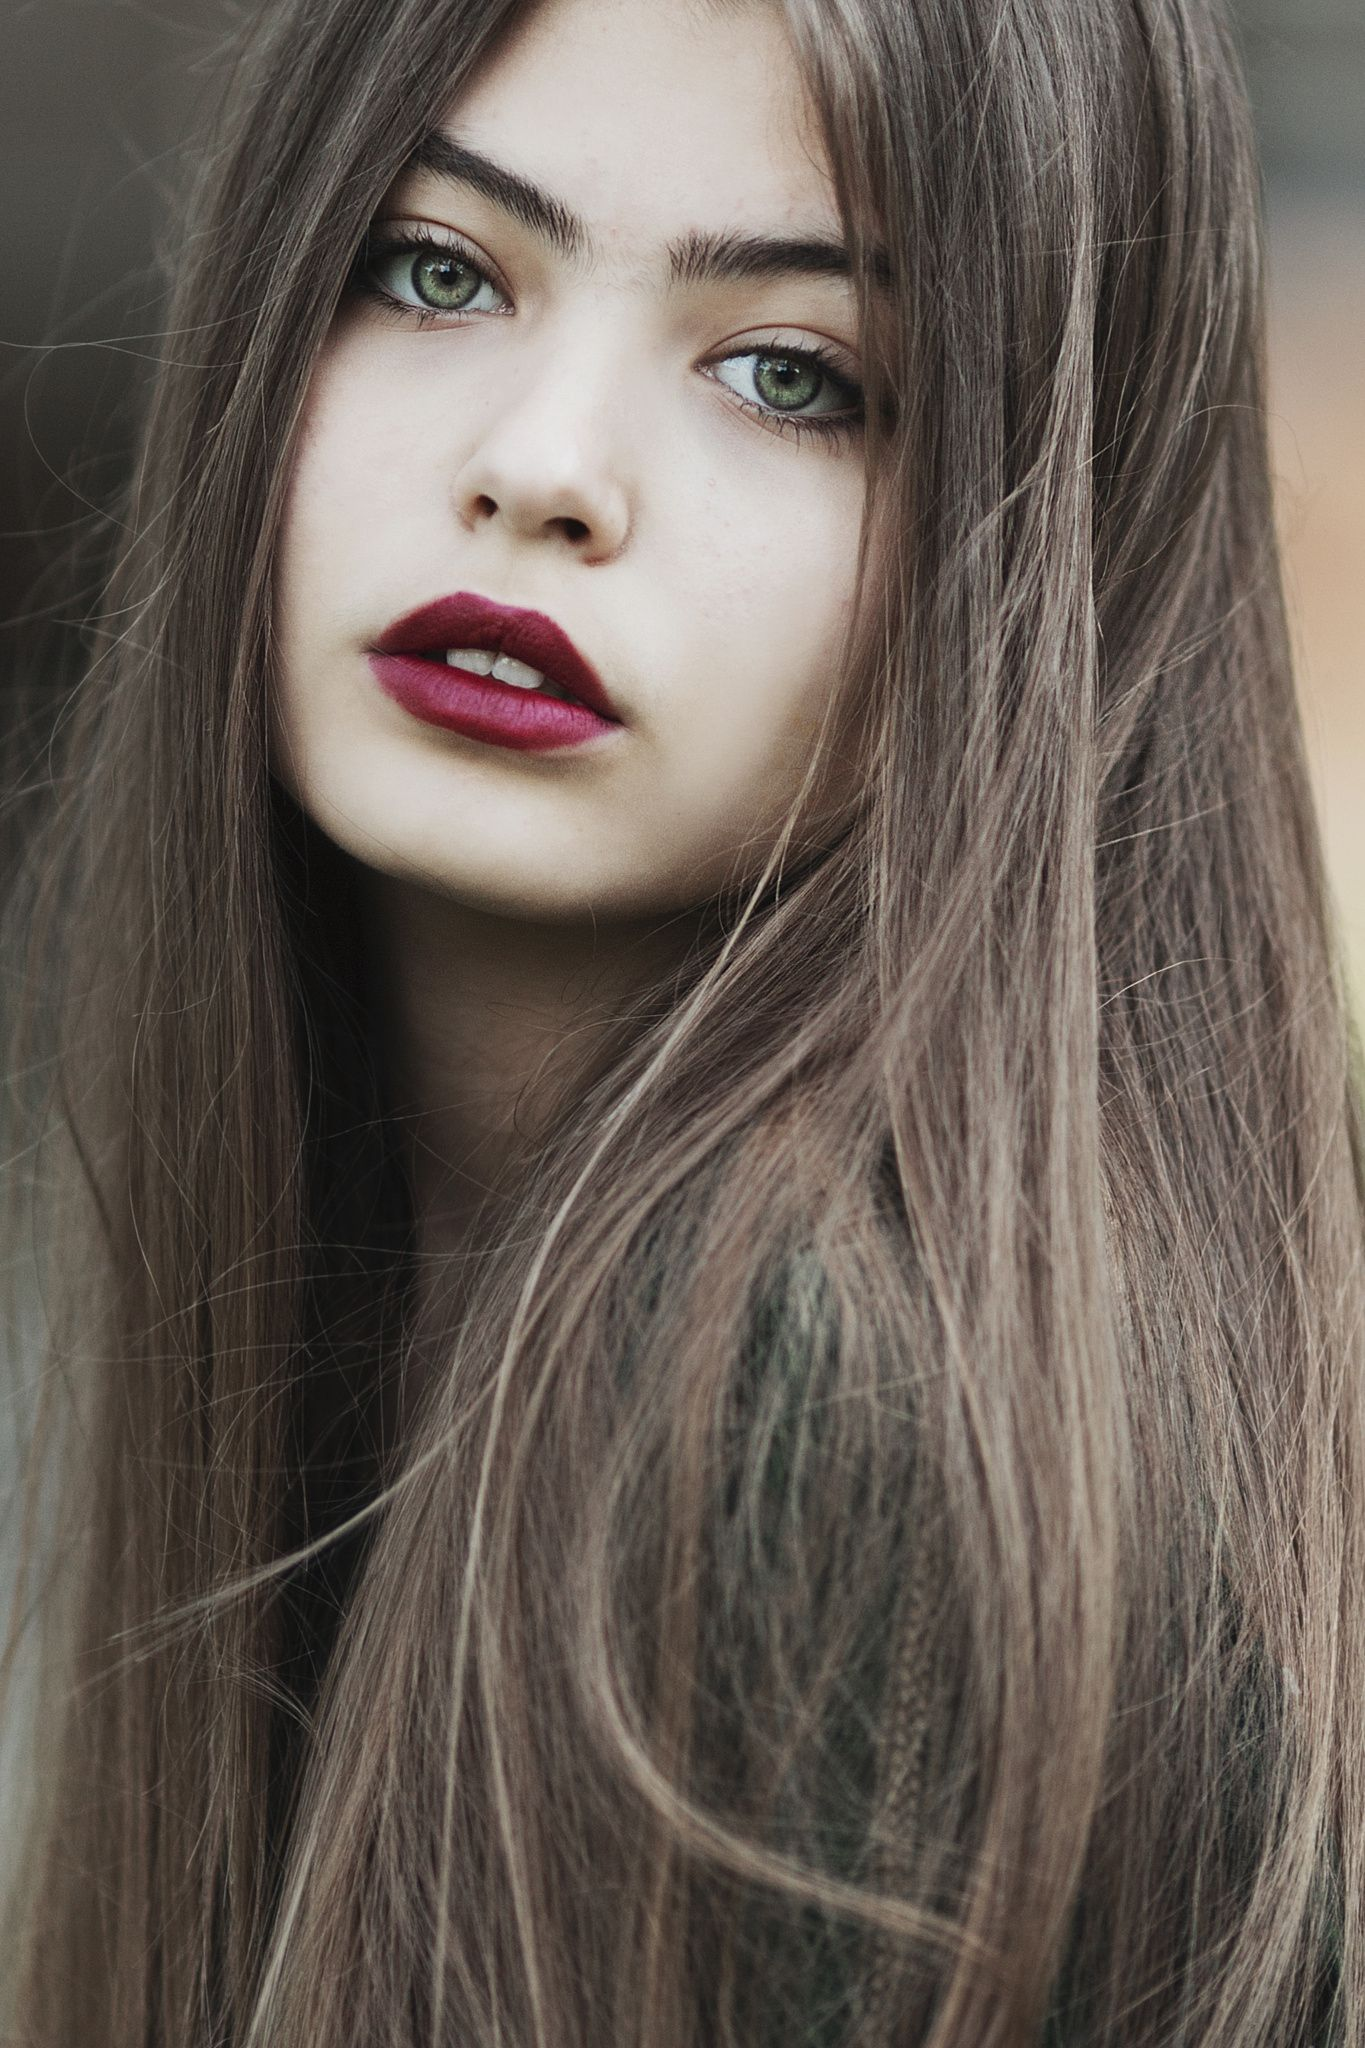 Blonde hair pale green eyes - Green Eyes Girl Portrait